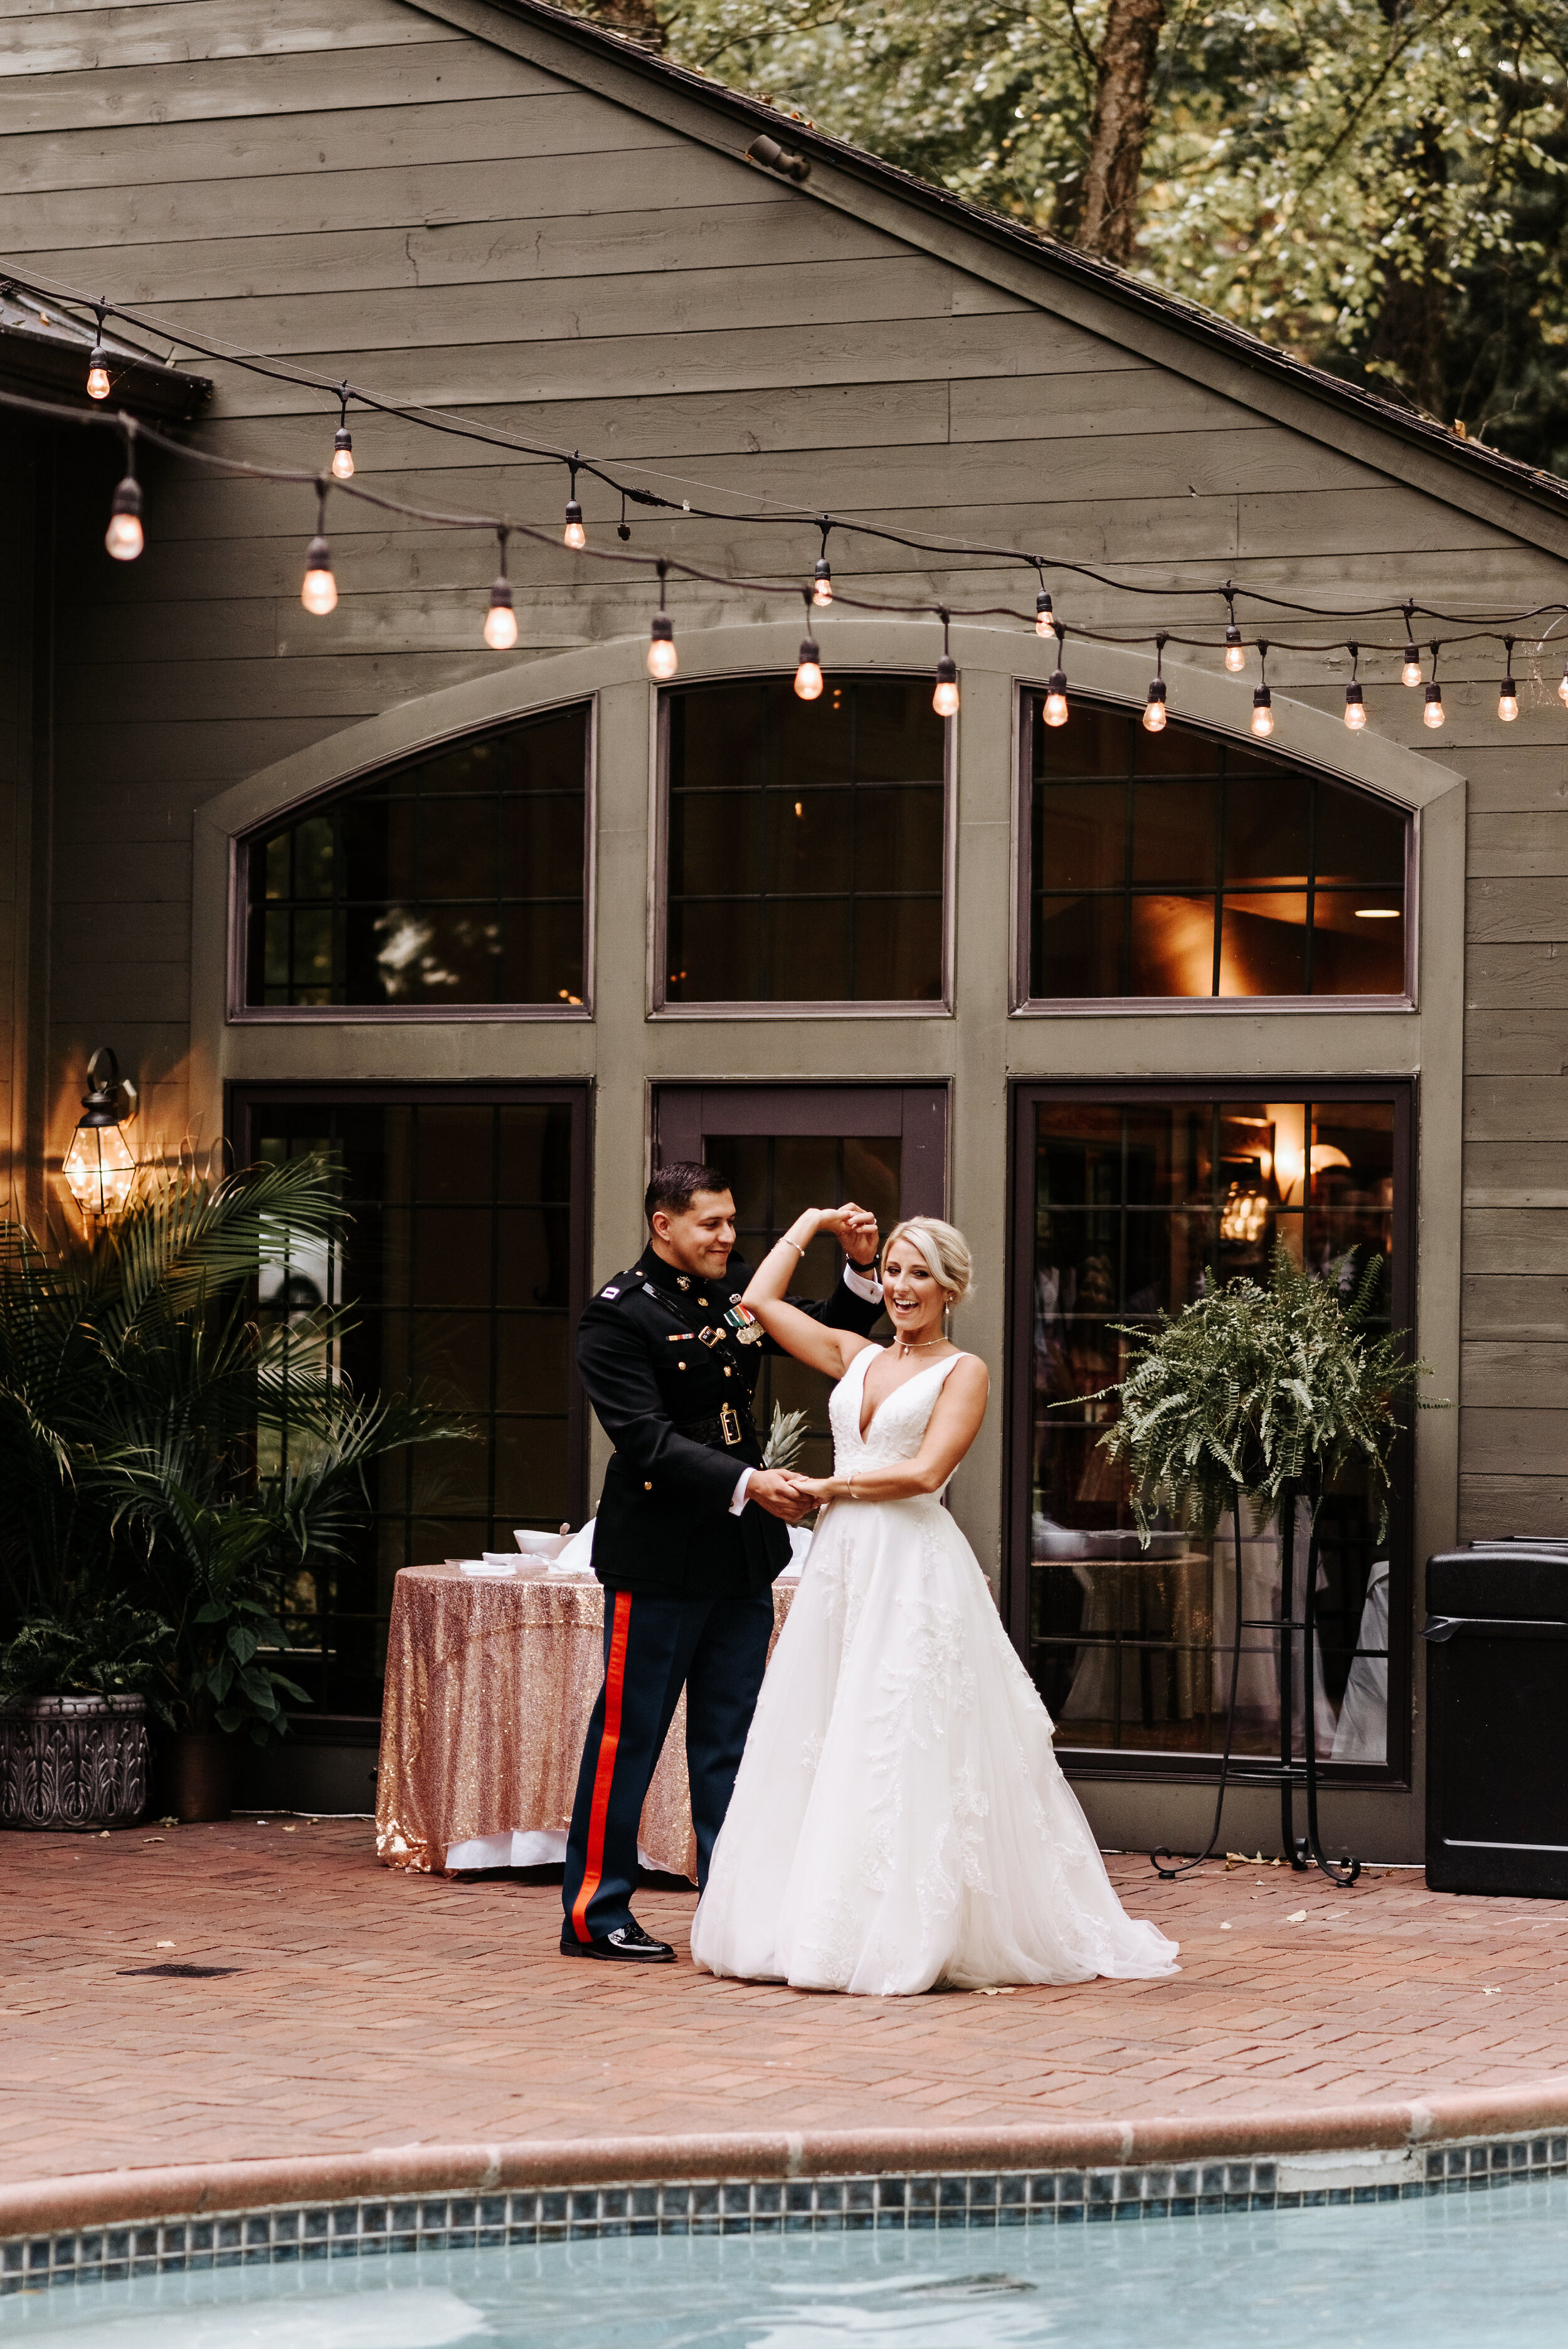 Emily_Mike_Wedding_Celebrations_at_the_Reservoir_Pool_Pavilion_Richmond_Virginia_Wedding_Photographer_Photography_by_V_74.jpg